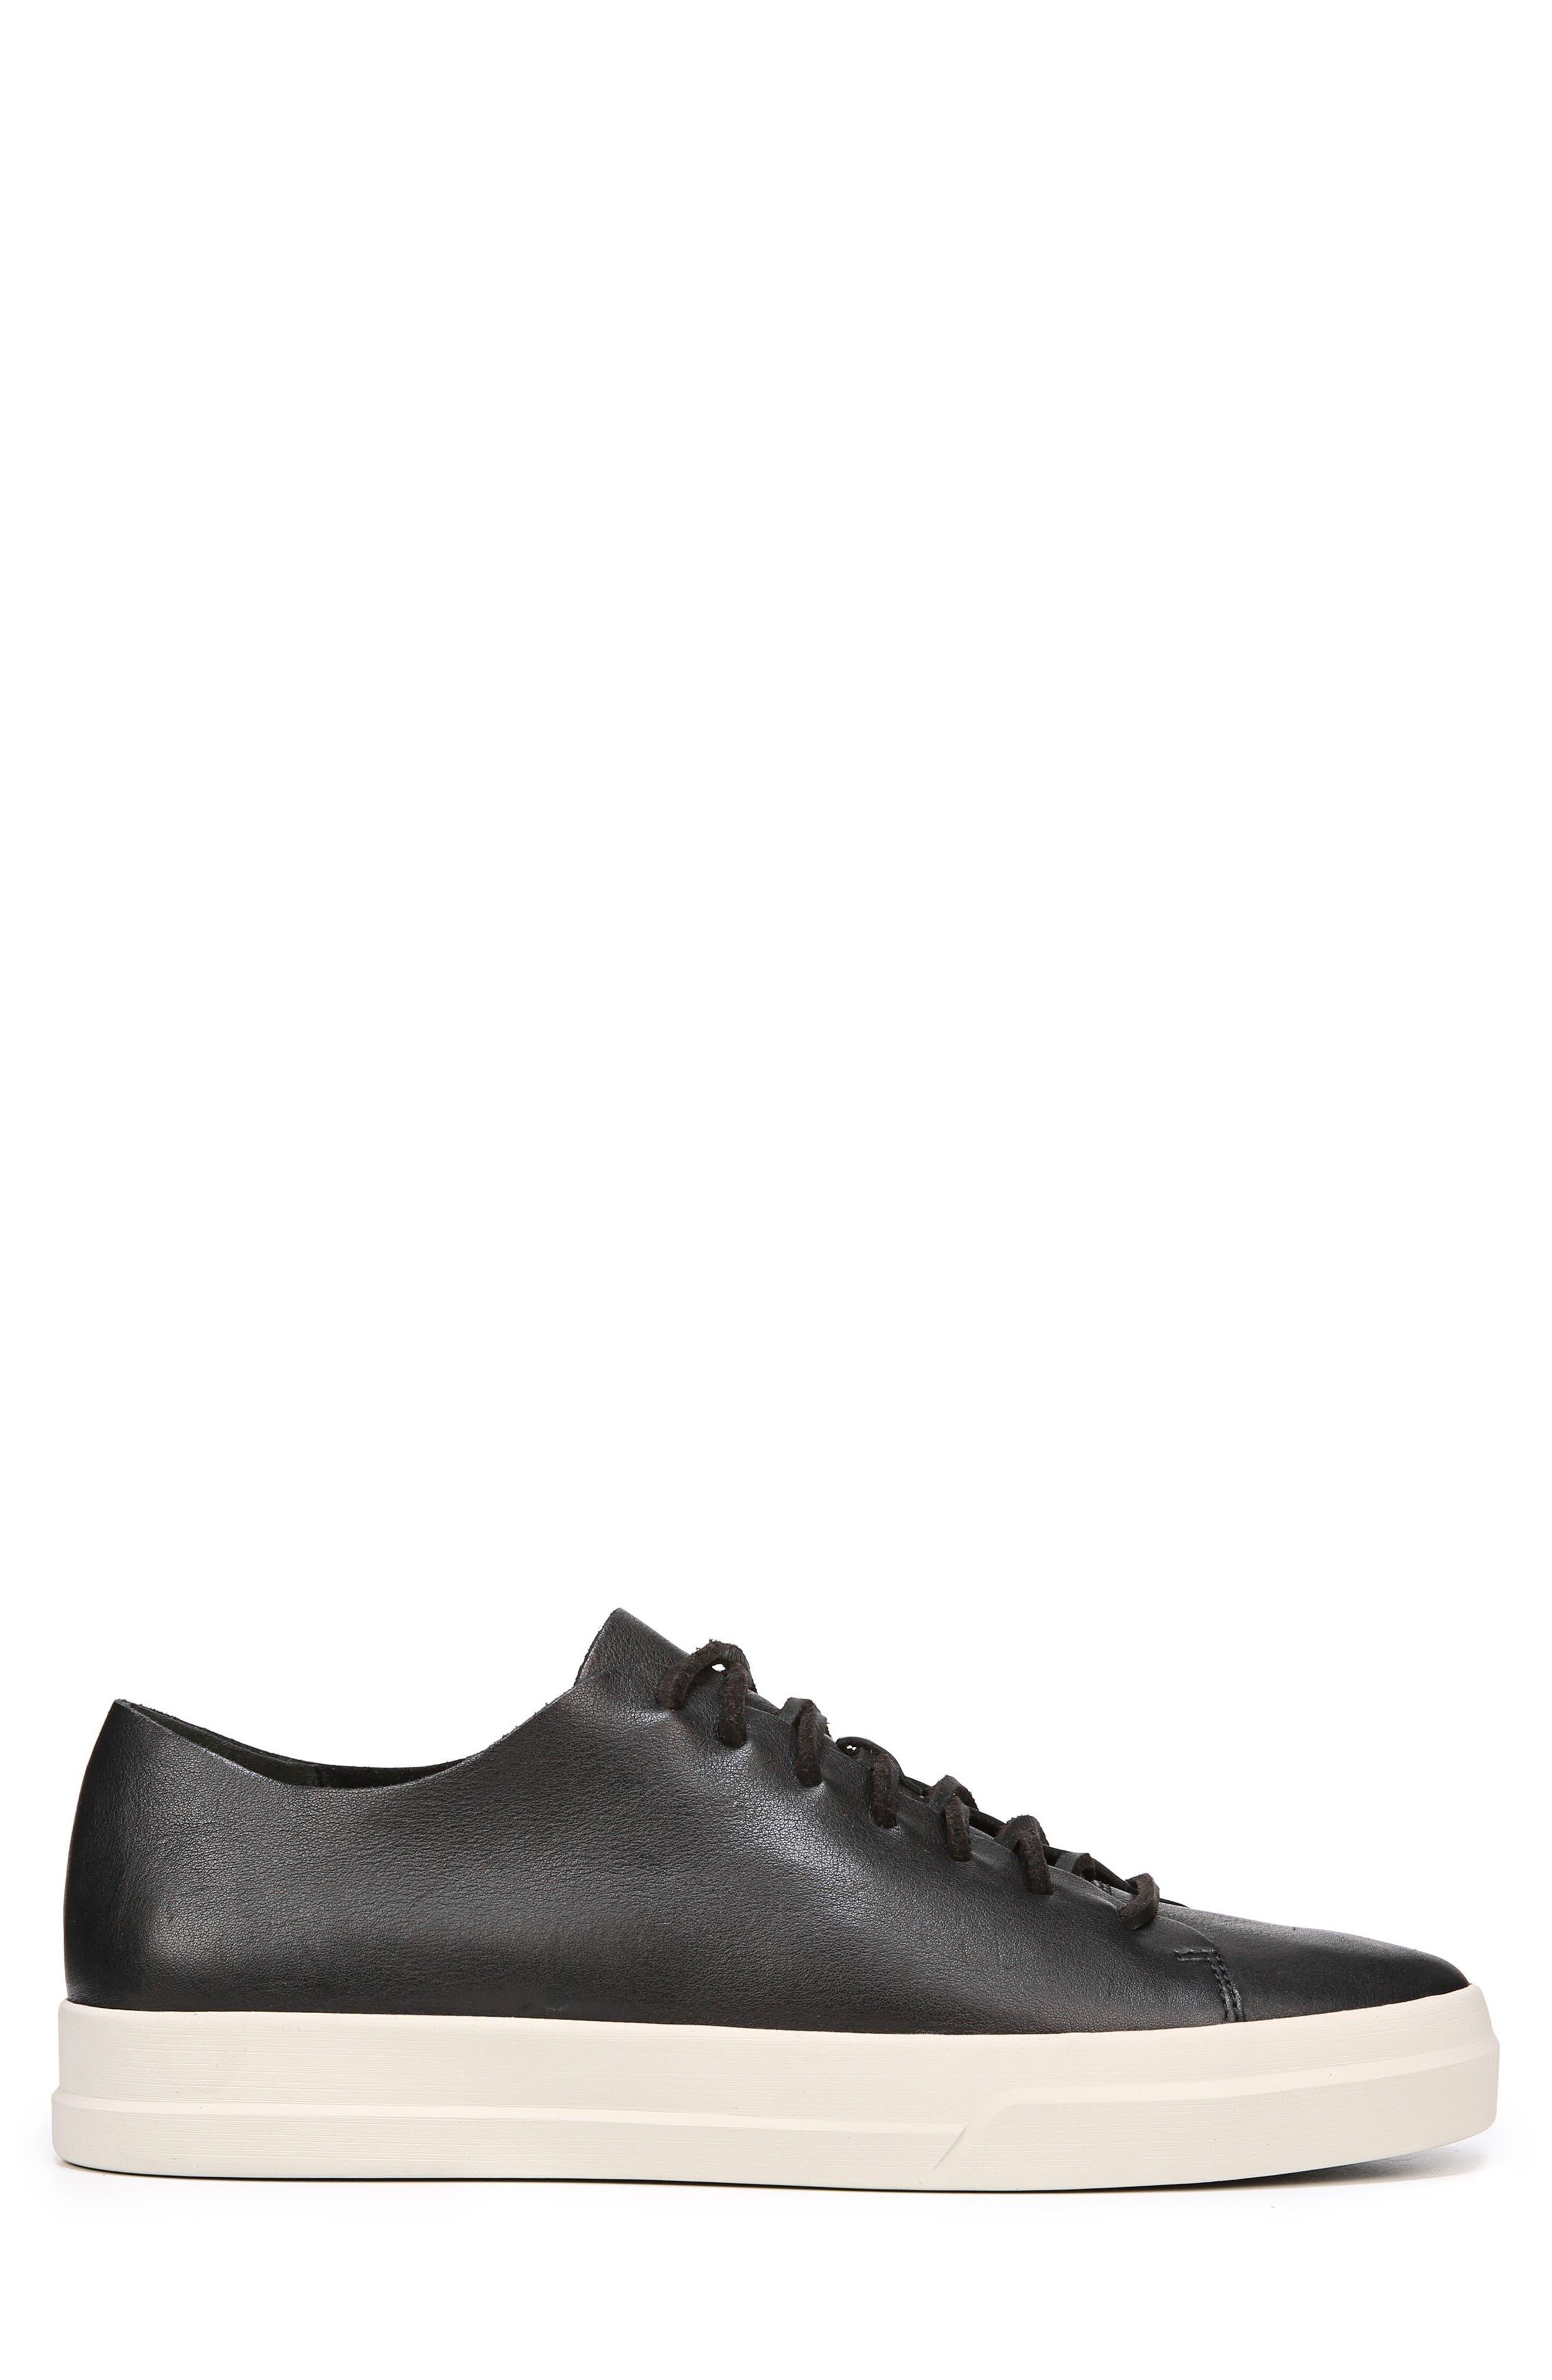 Copeland Sneaker,                             Alternate thumbnail 4, color,                             Black